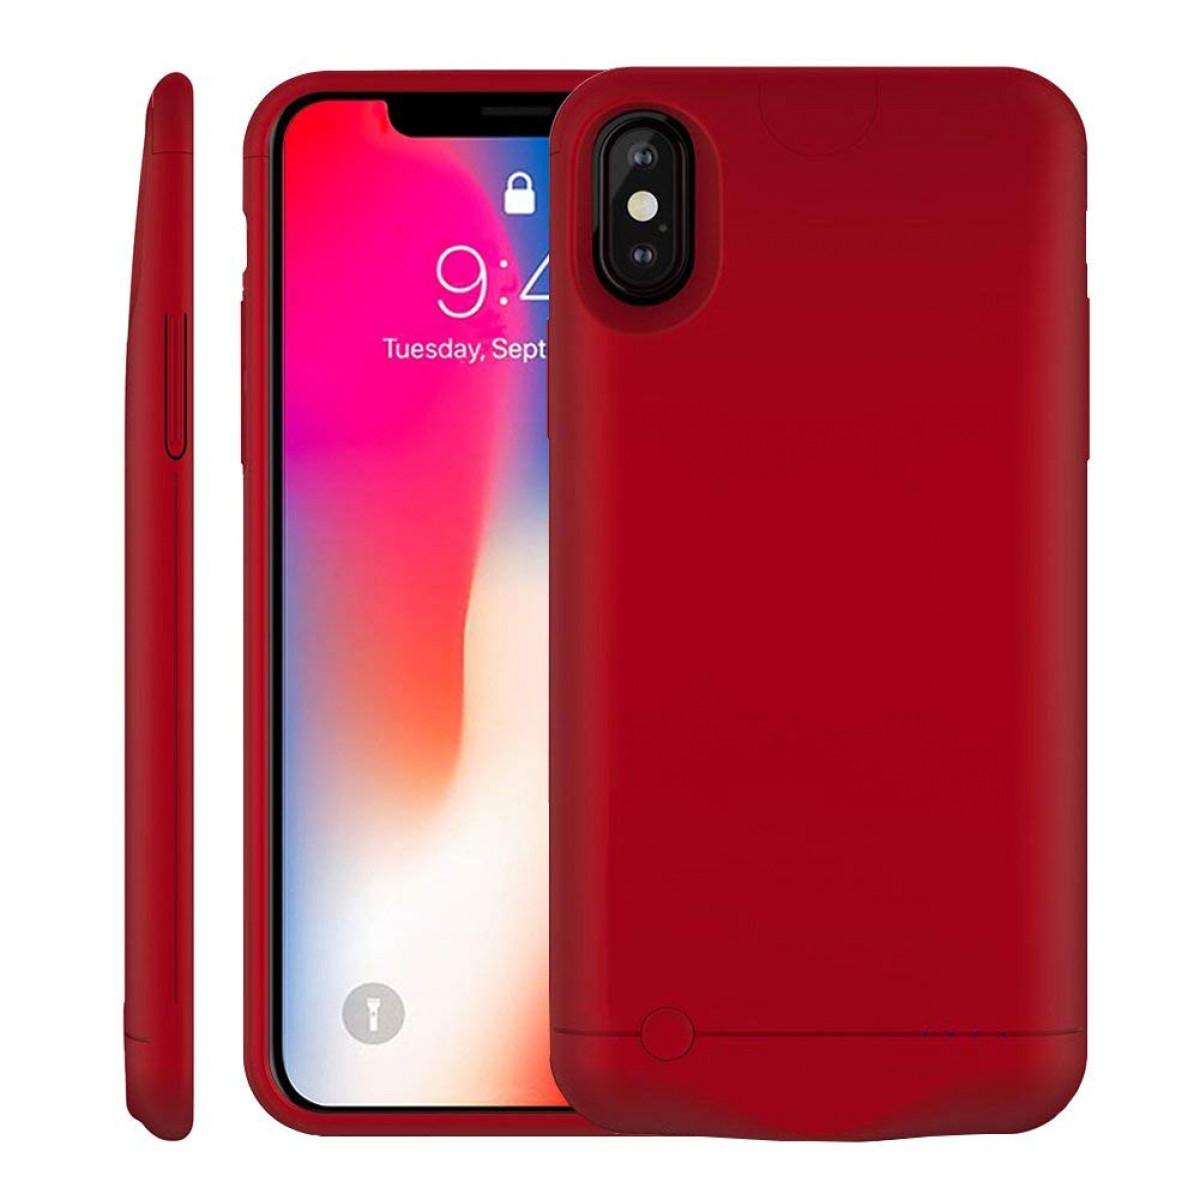 new product c260e 5e97c iPhone X/XS Battery Case, MAXBEAR 5200mAh Ultra Slim Portable Extended  Backup Battery Charger Case Charging Case Battery Pack for iPhone X/XS,  iPhone ...